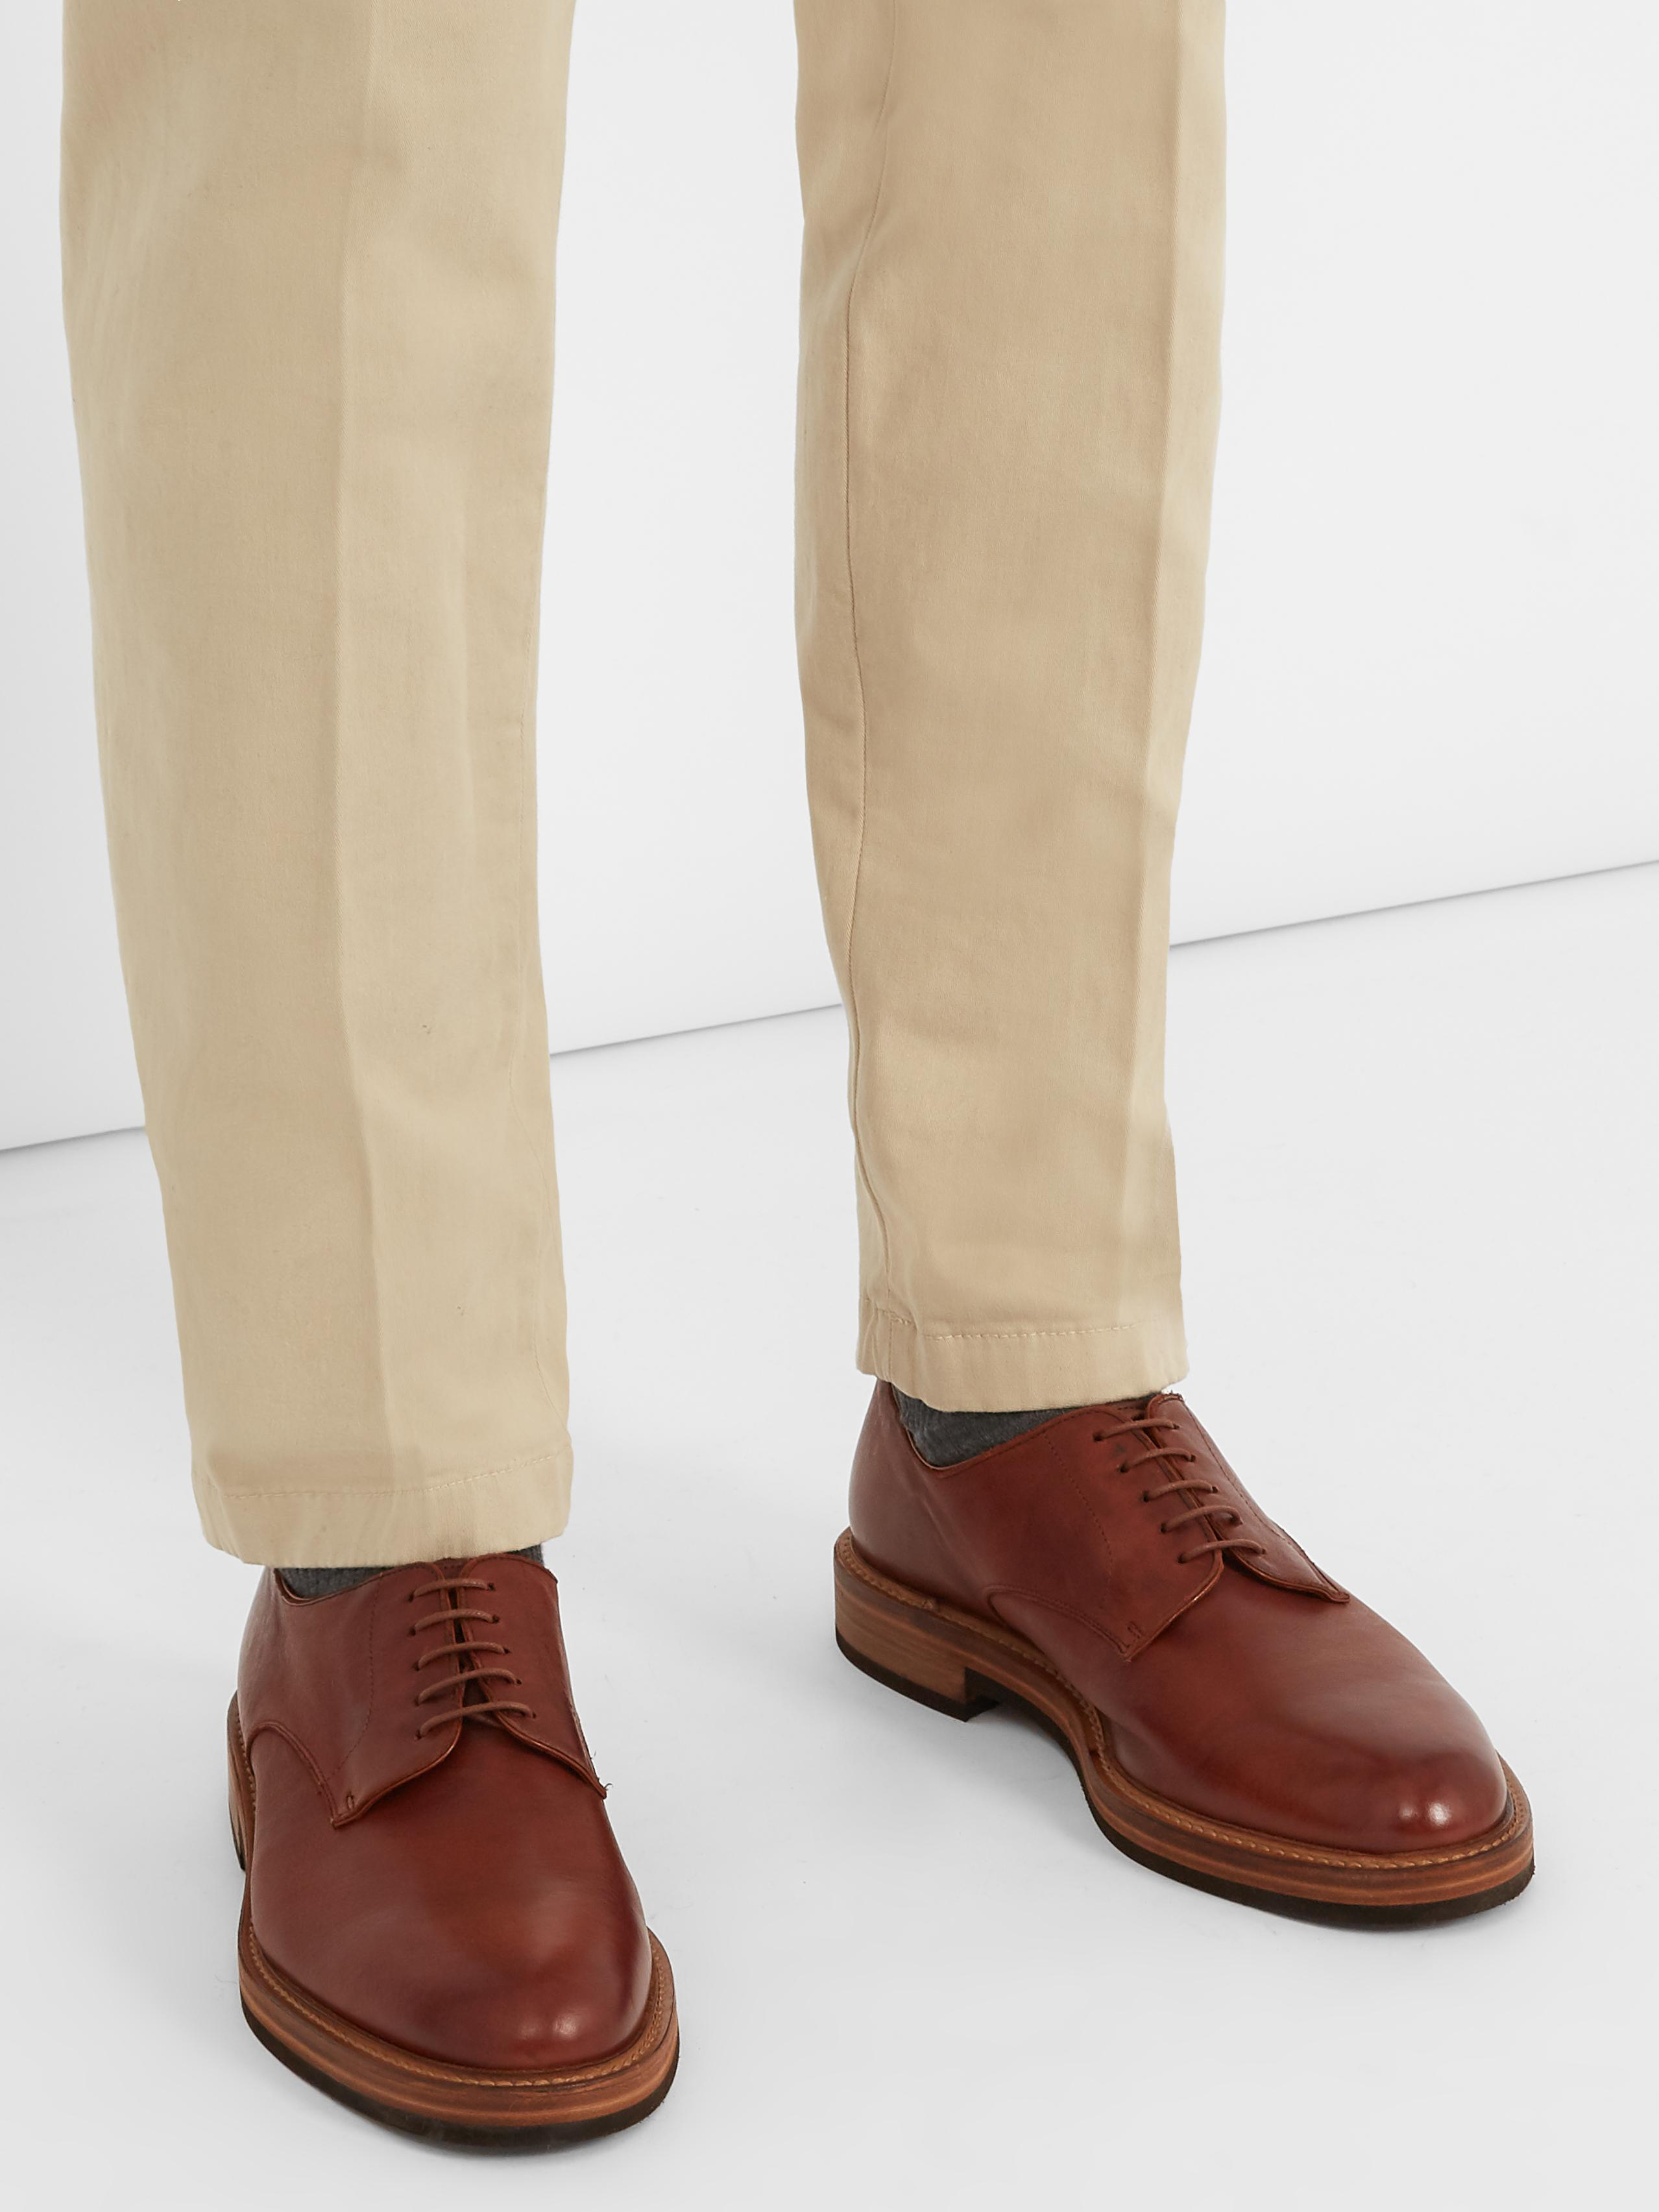 Fratelli Rossetti Batik Leather Derby Shoes in Tan (Brown) for Men